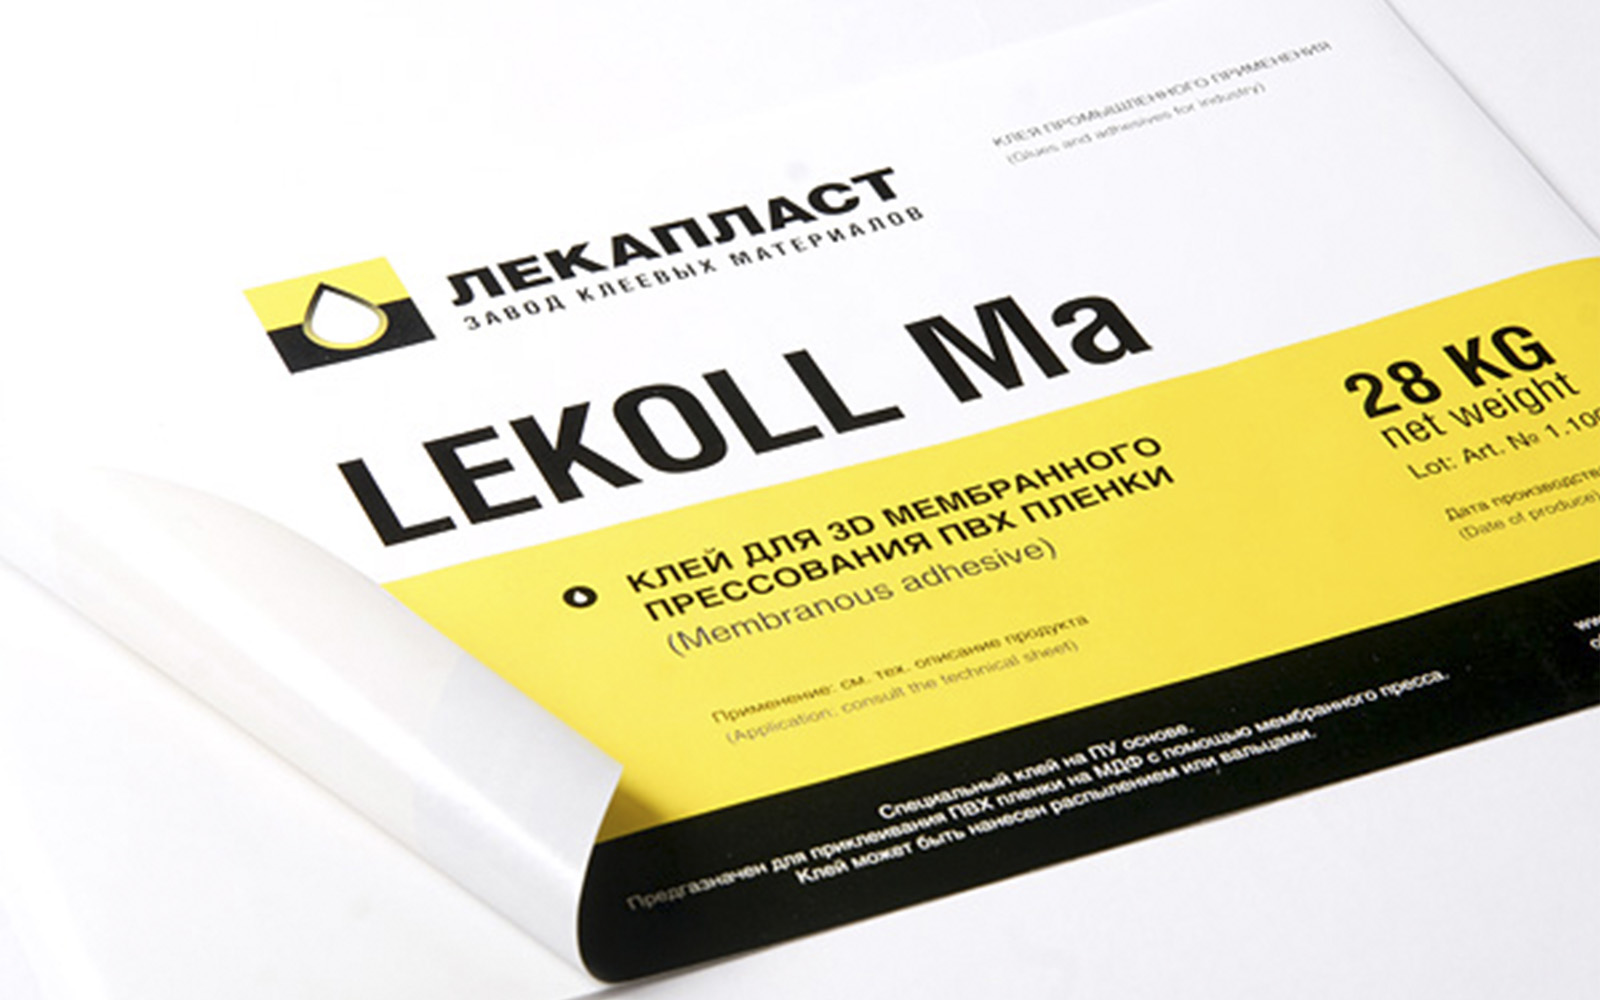 Наклейка ЛЕКАПЛАСТ - printermedia ru